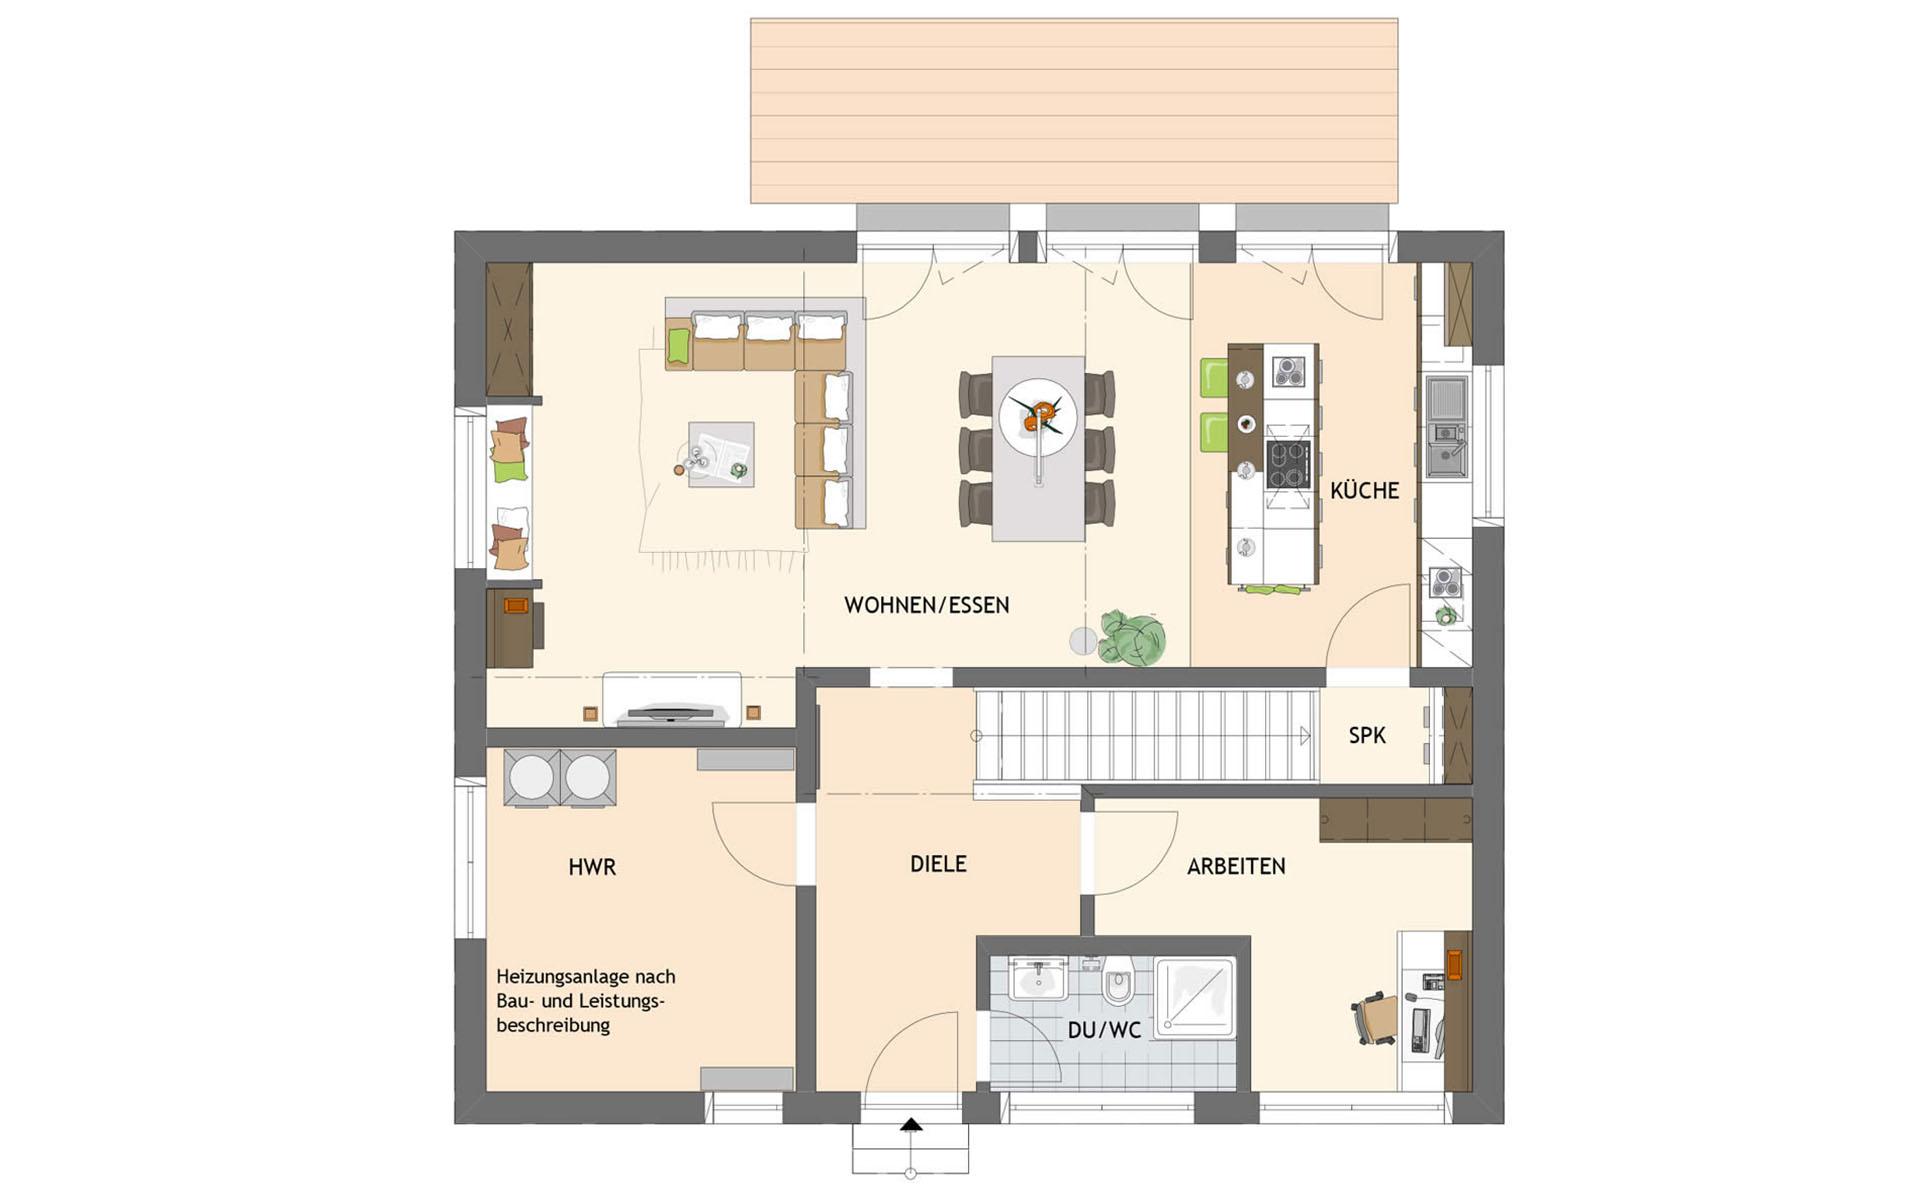 Erdgeschoss SENTO 504 K S130 von FingerHaus GmbH